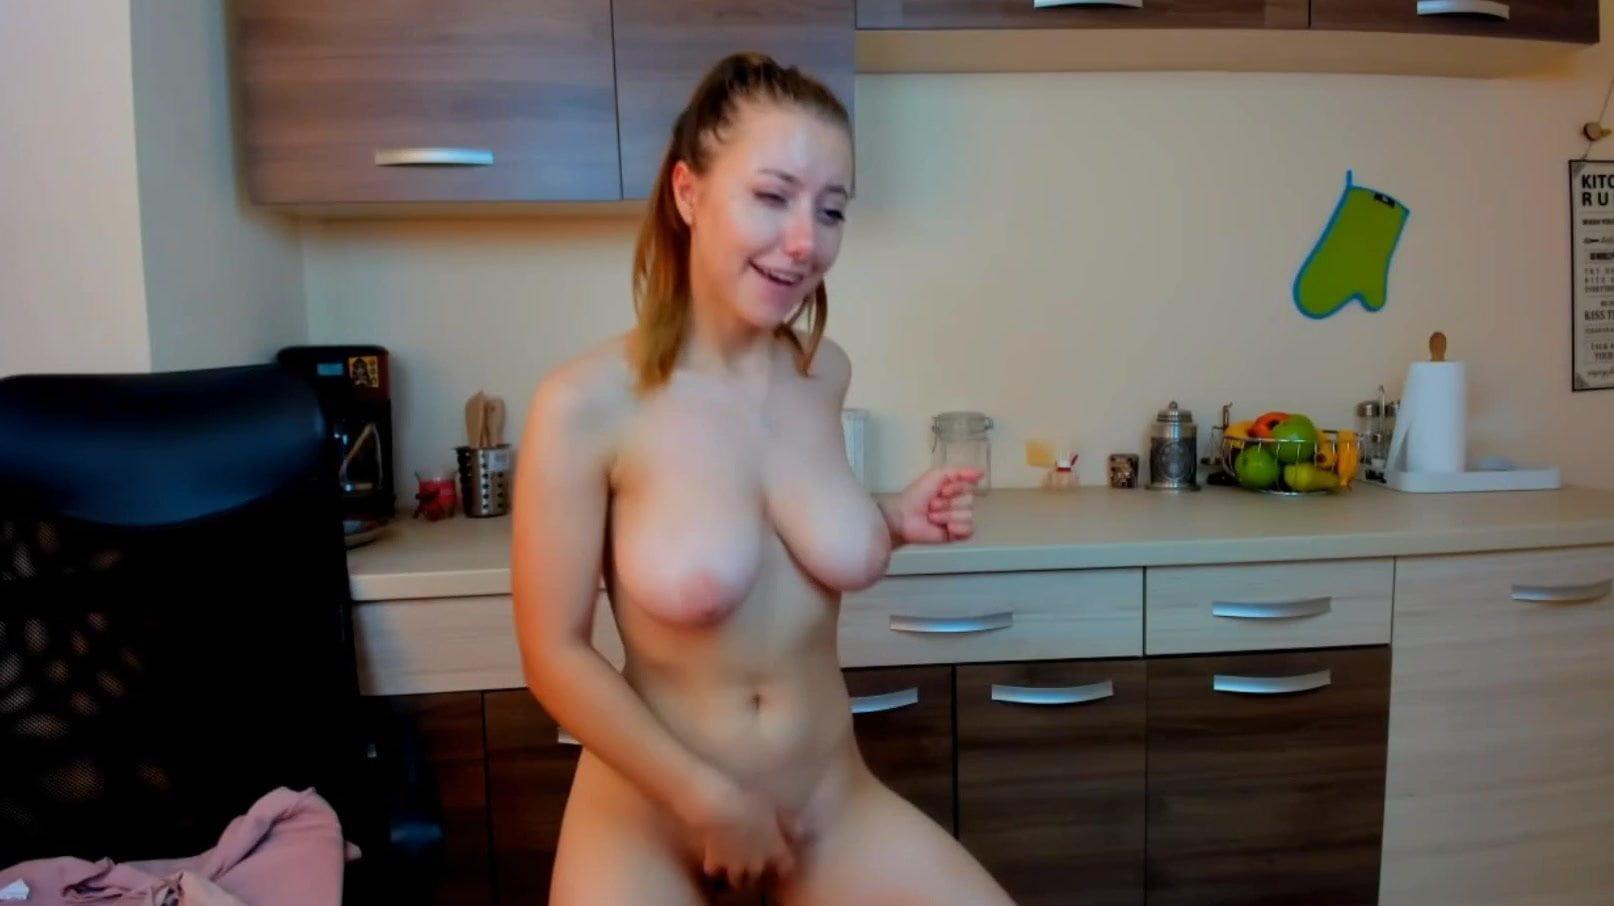 Sweety pie porn pics xxx images